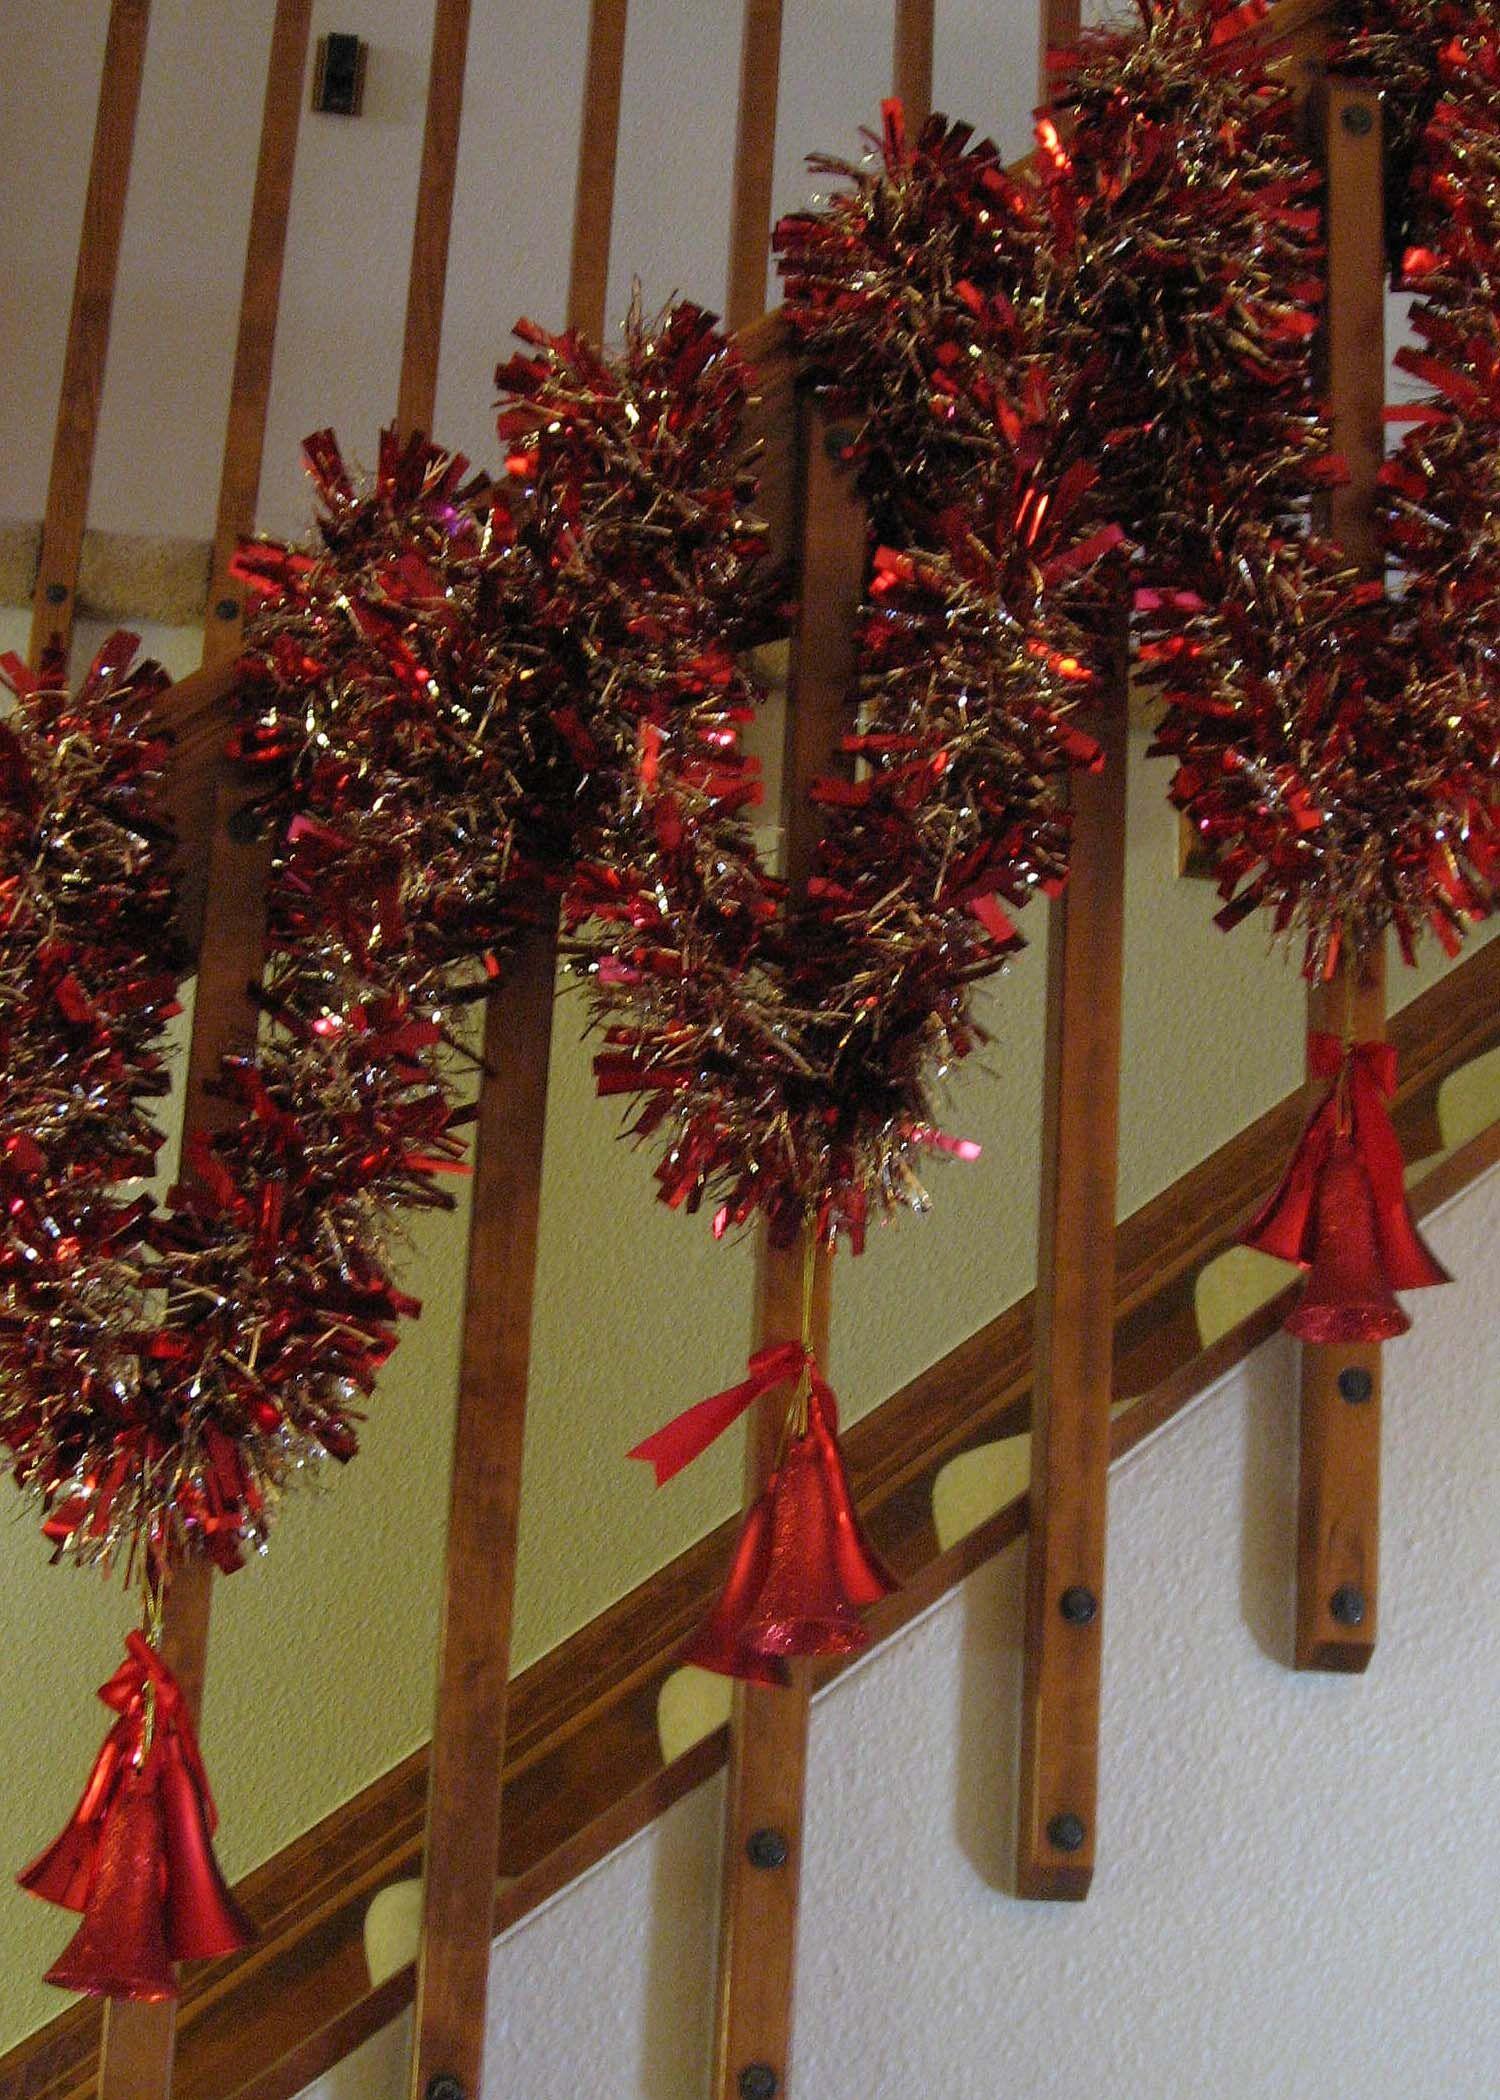 Banister Decorations   Christmas 2012   Pinterest ...